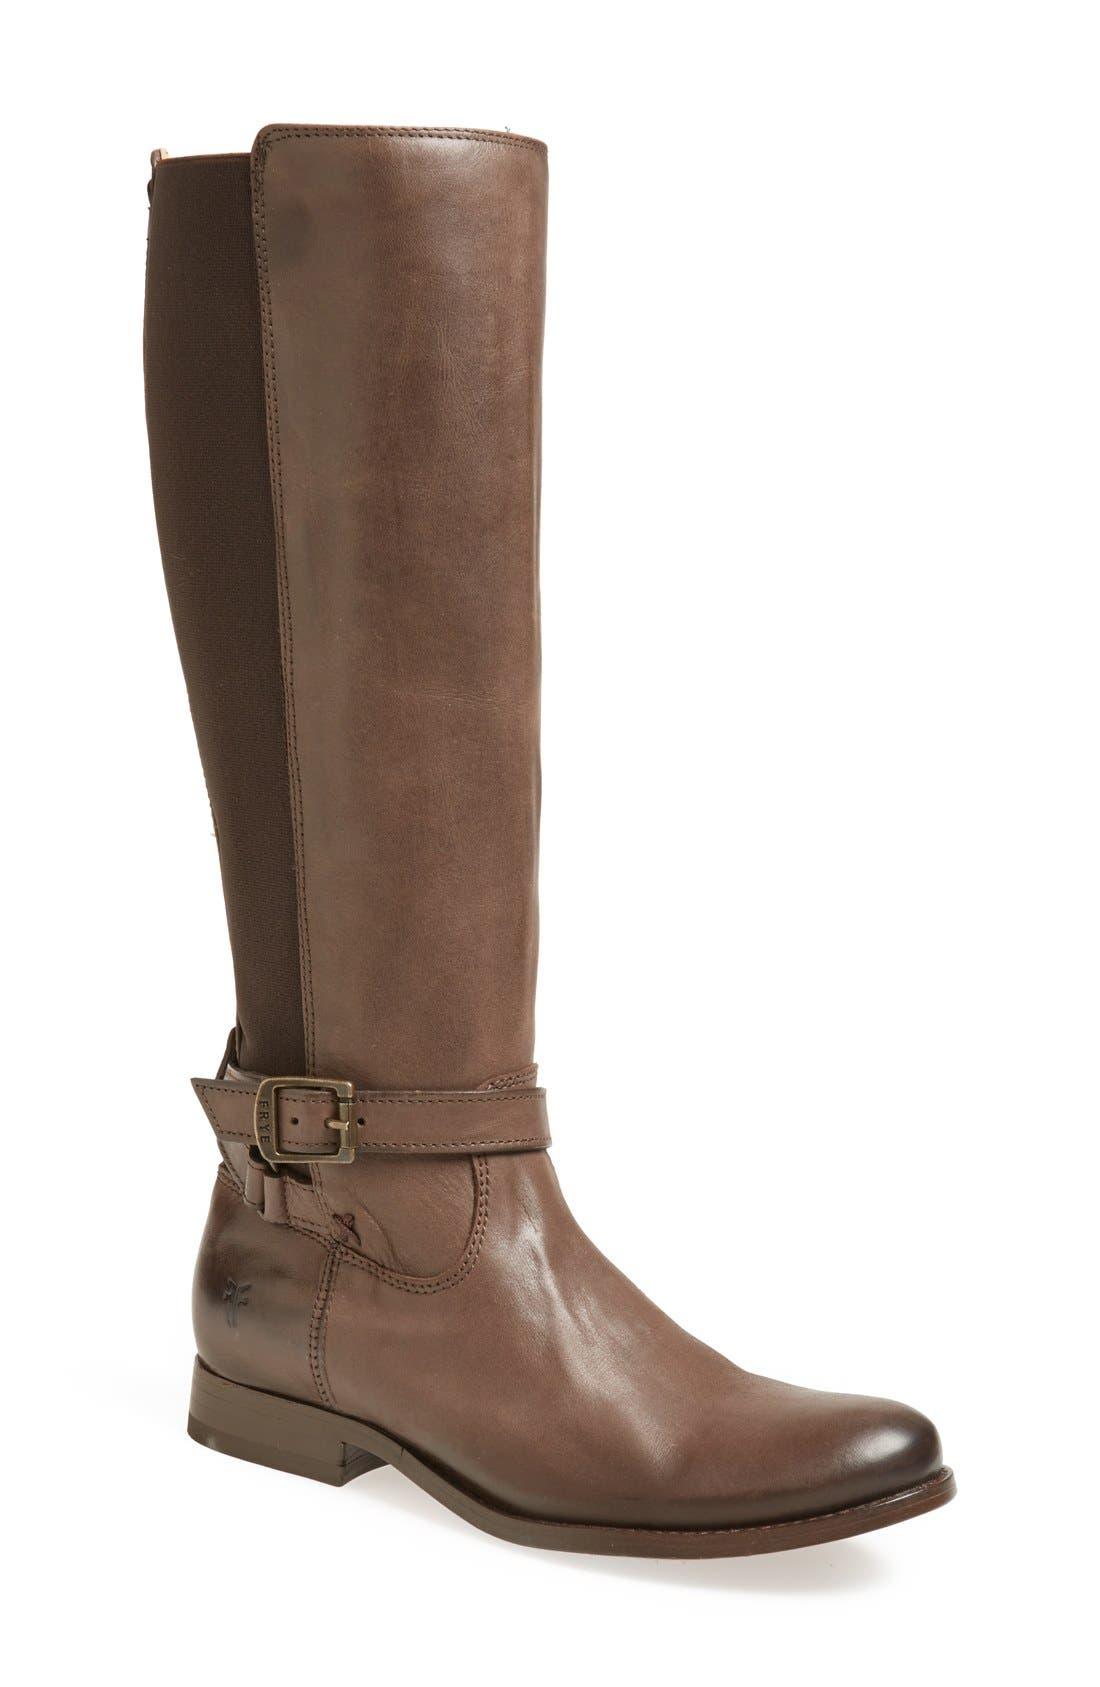 Alternate Image 1 Selected - Frye 'Melissa' Gore Zip Boot